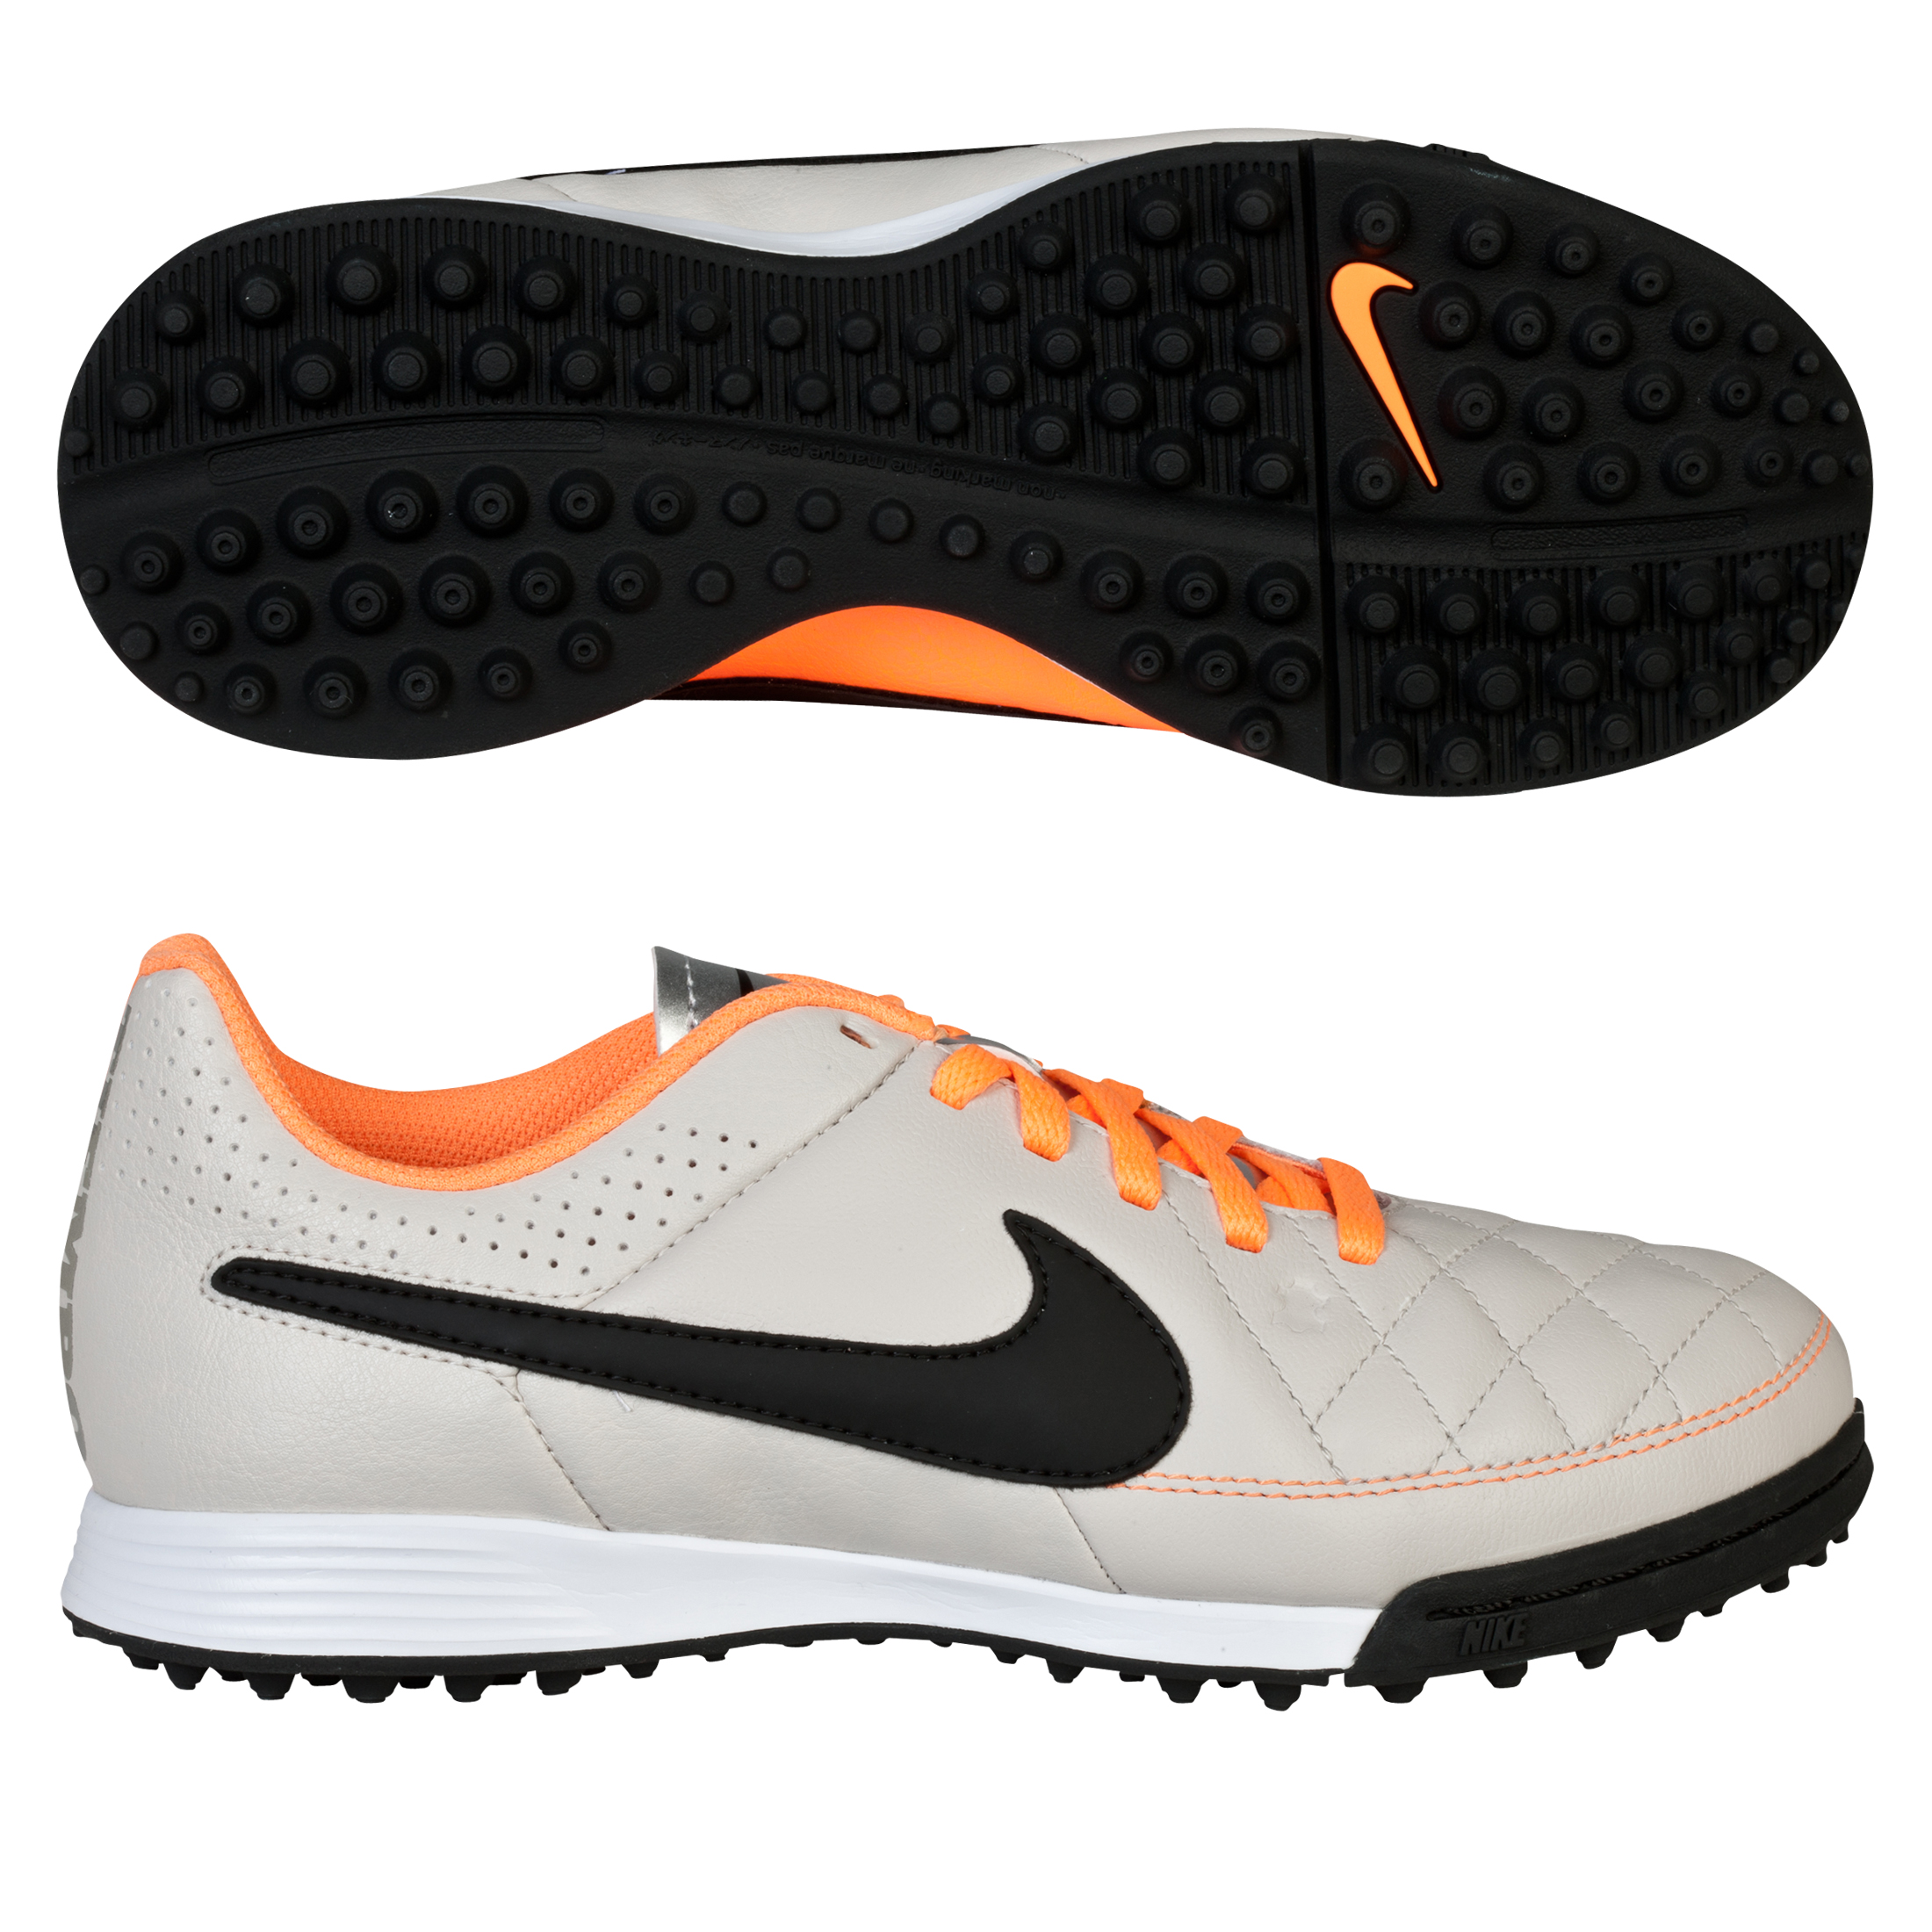 Nike Tiempo Genio Astroturf Trainers - Kids Beige